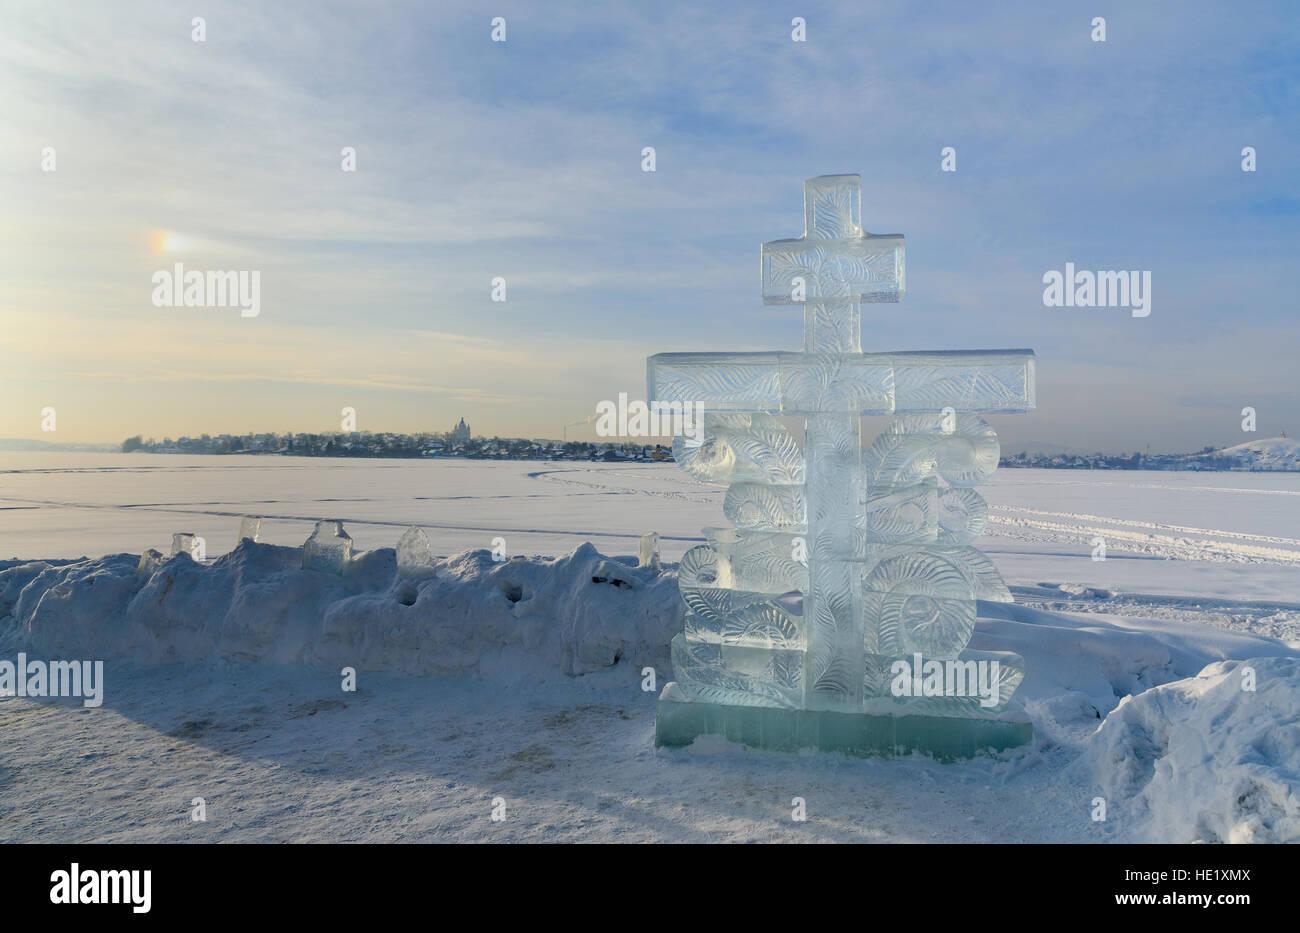 epiphany bathing in ice hole stock photos epiphany. Black Bedroom Furniture Sets. Home Design Ideas